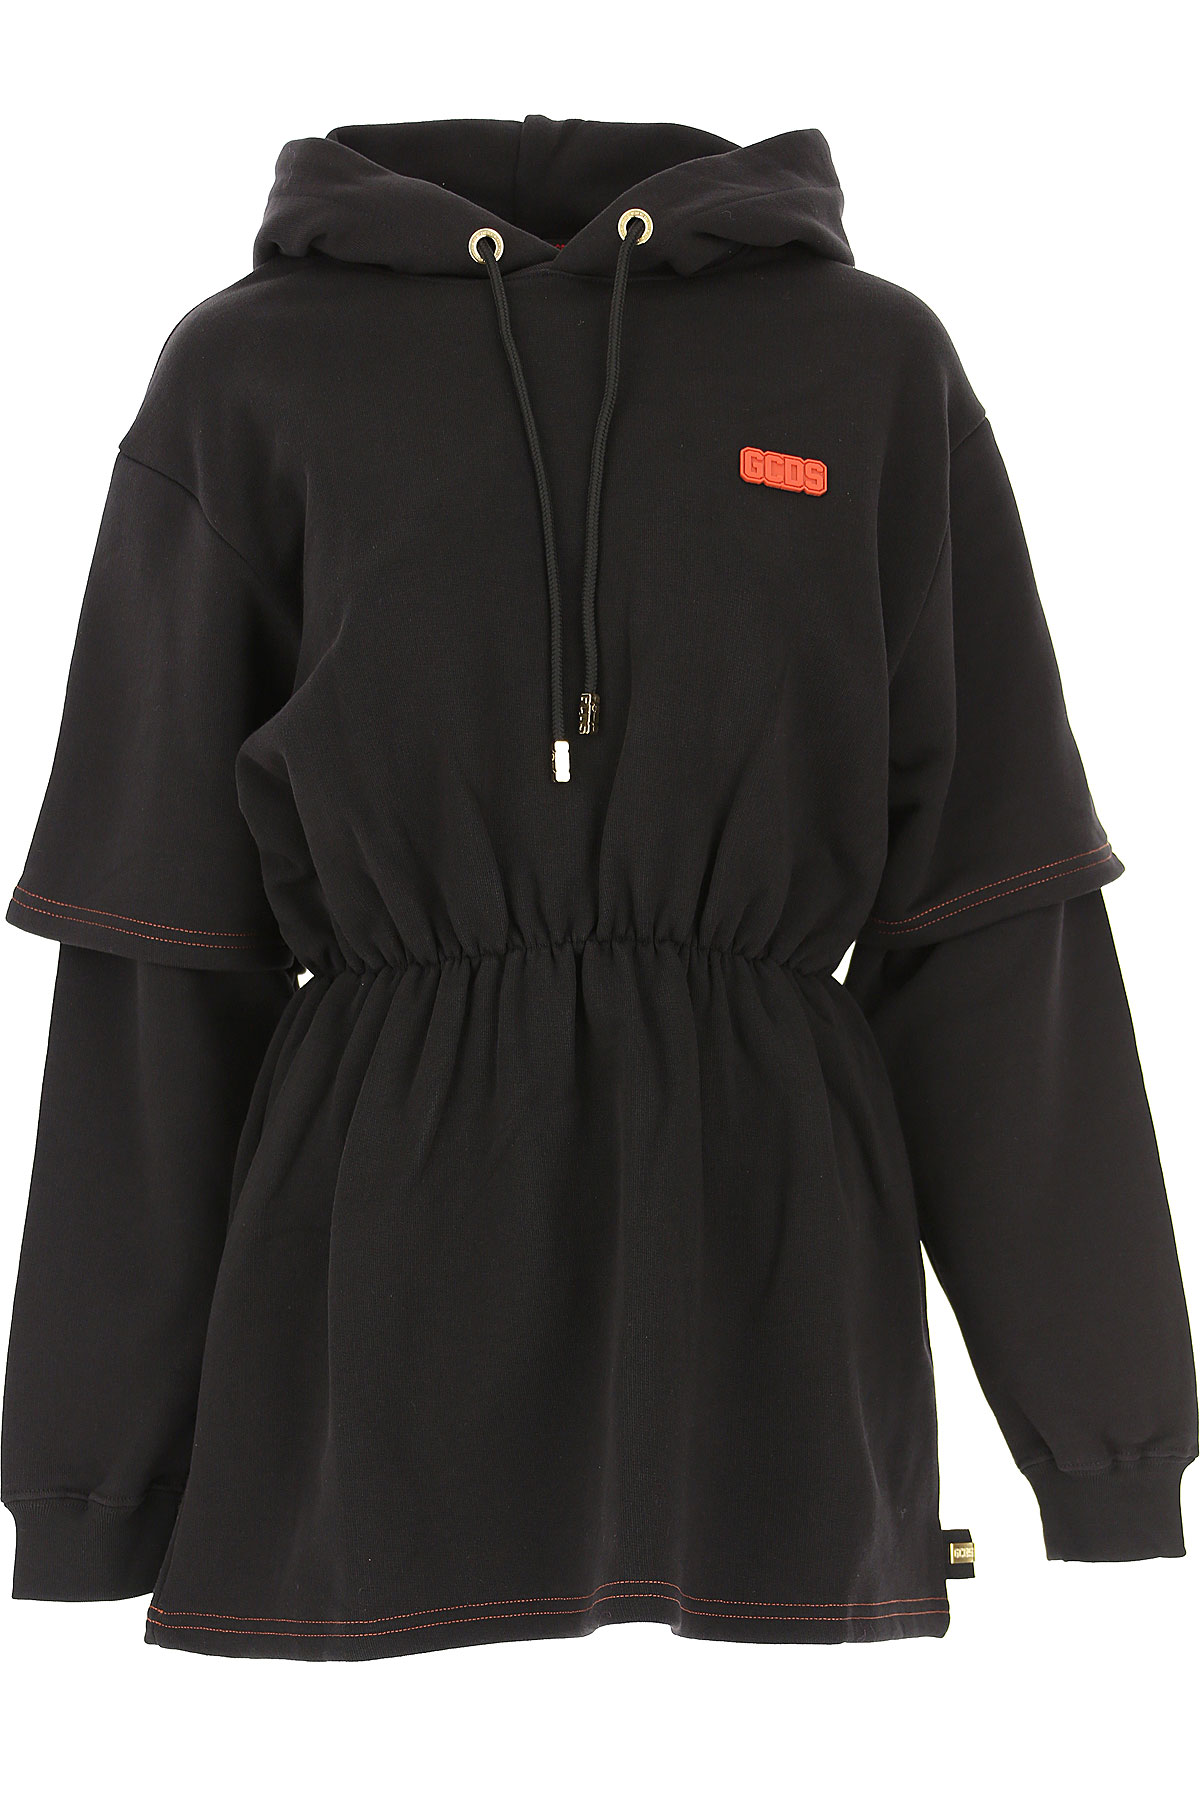 GCDS Dress for Women, Evening Cocktail Party On Sale, Black, Cotton, 2019, 4 6 8